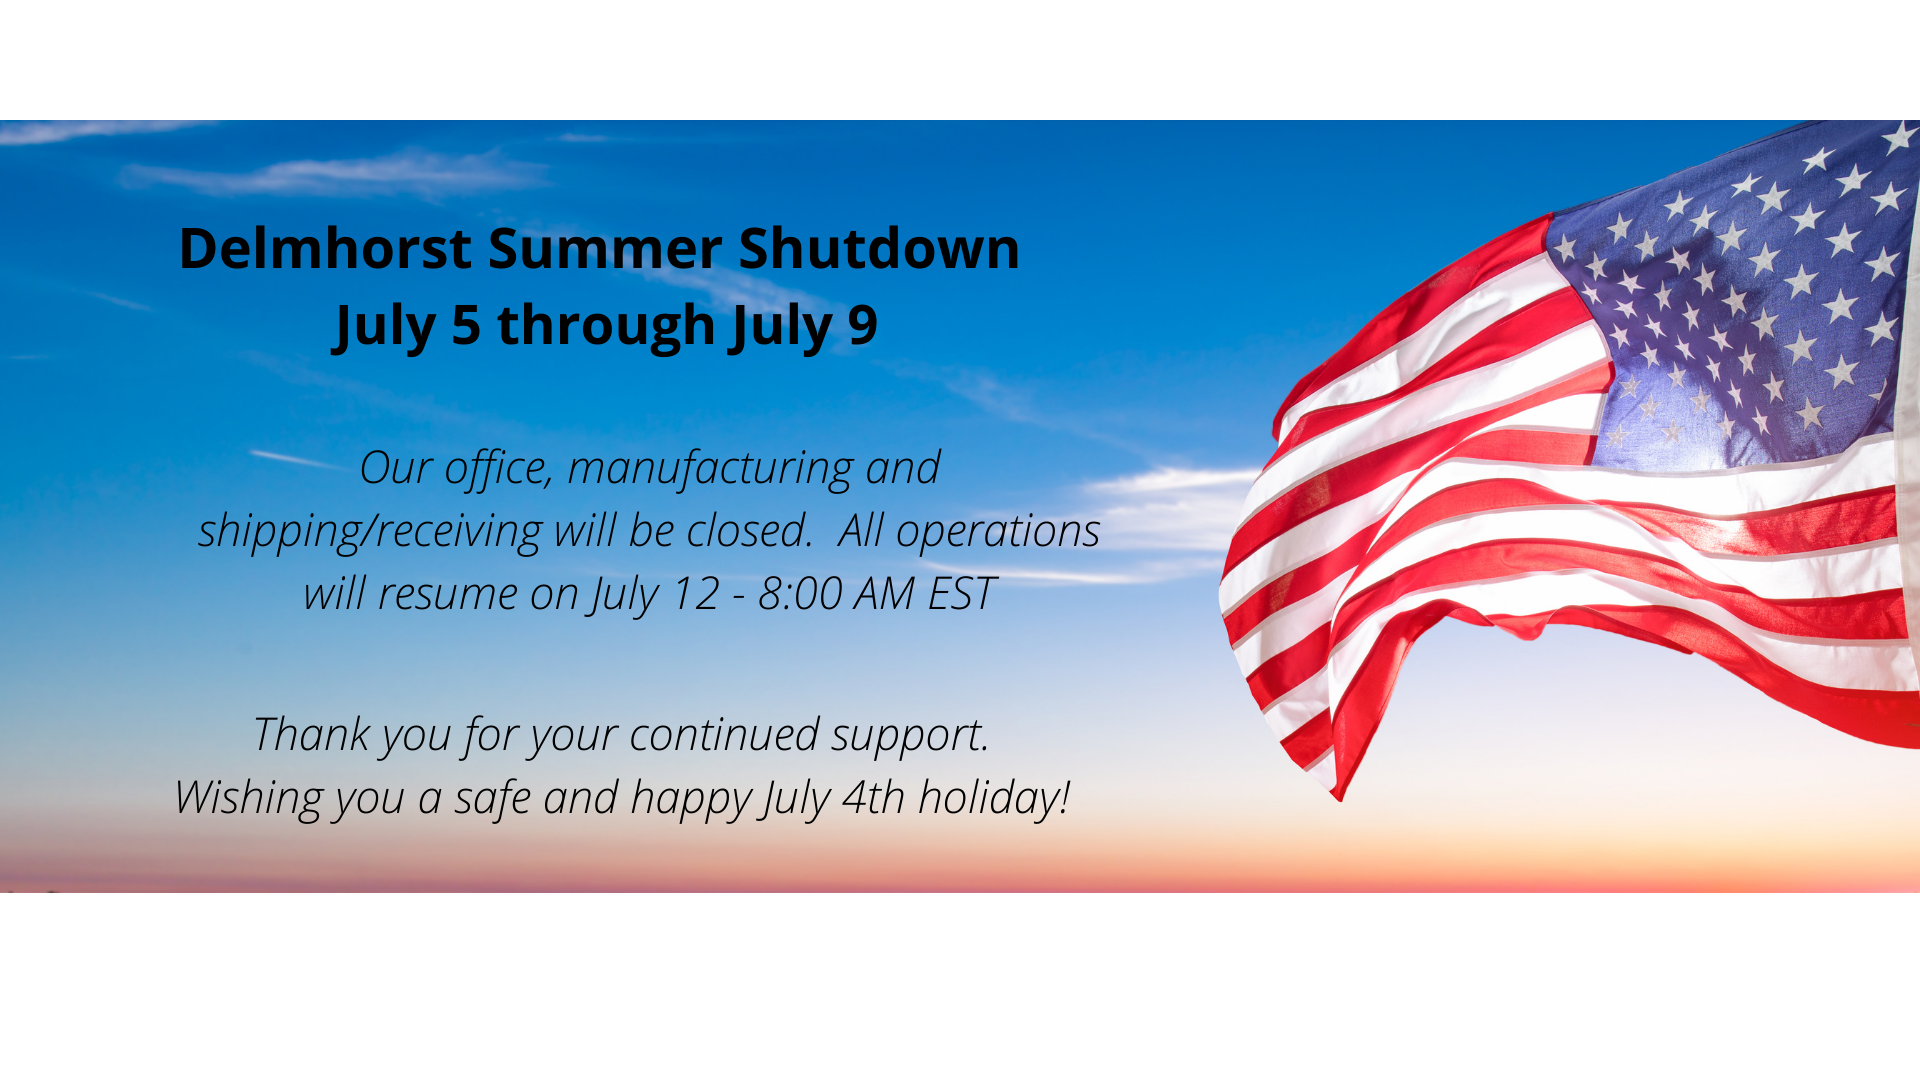 Copy of Delmhorst Summer Shutdown (1)